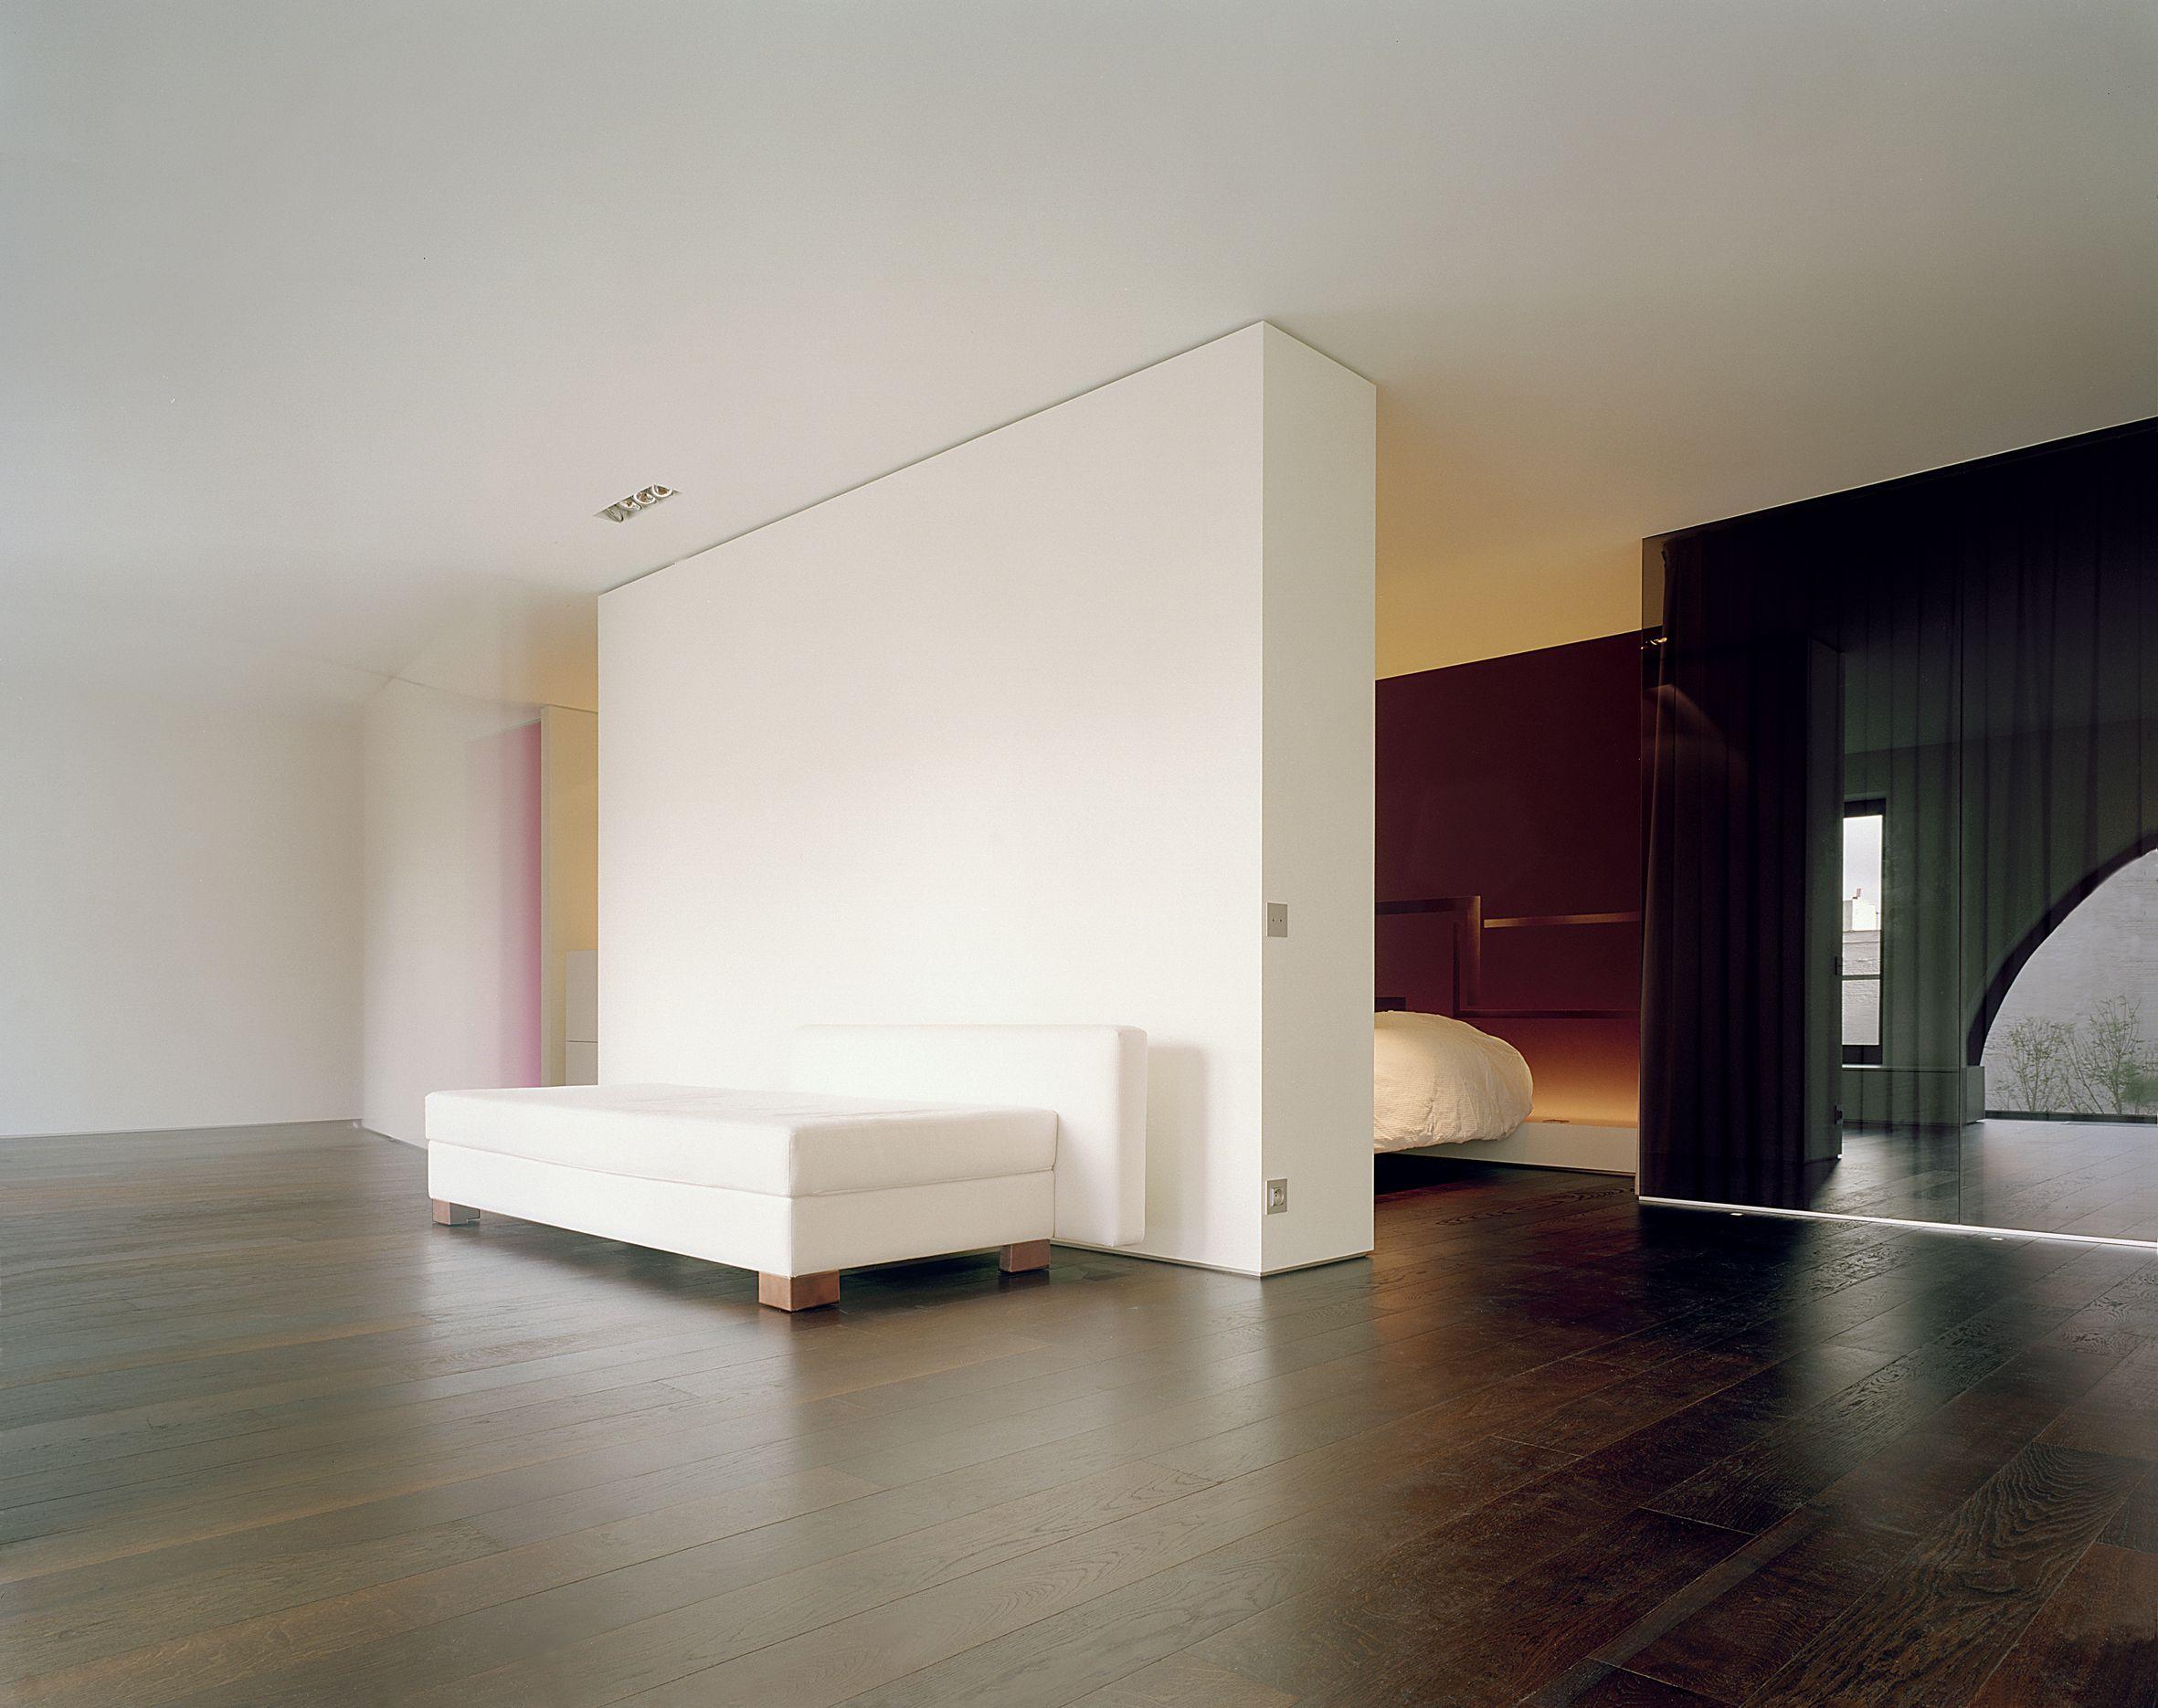 LOFT 1D | Filip Deslee | Loft & Apartments | Pinterest | Lofts ...